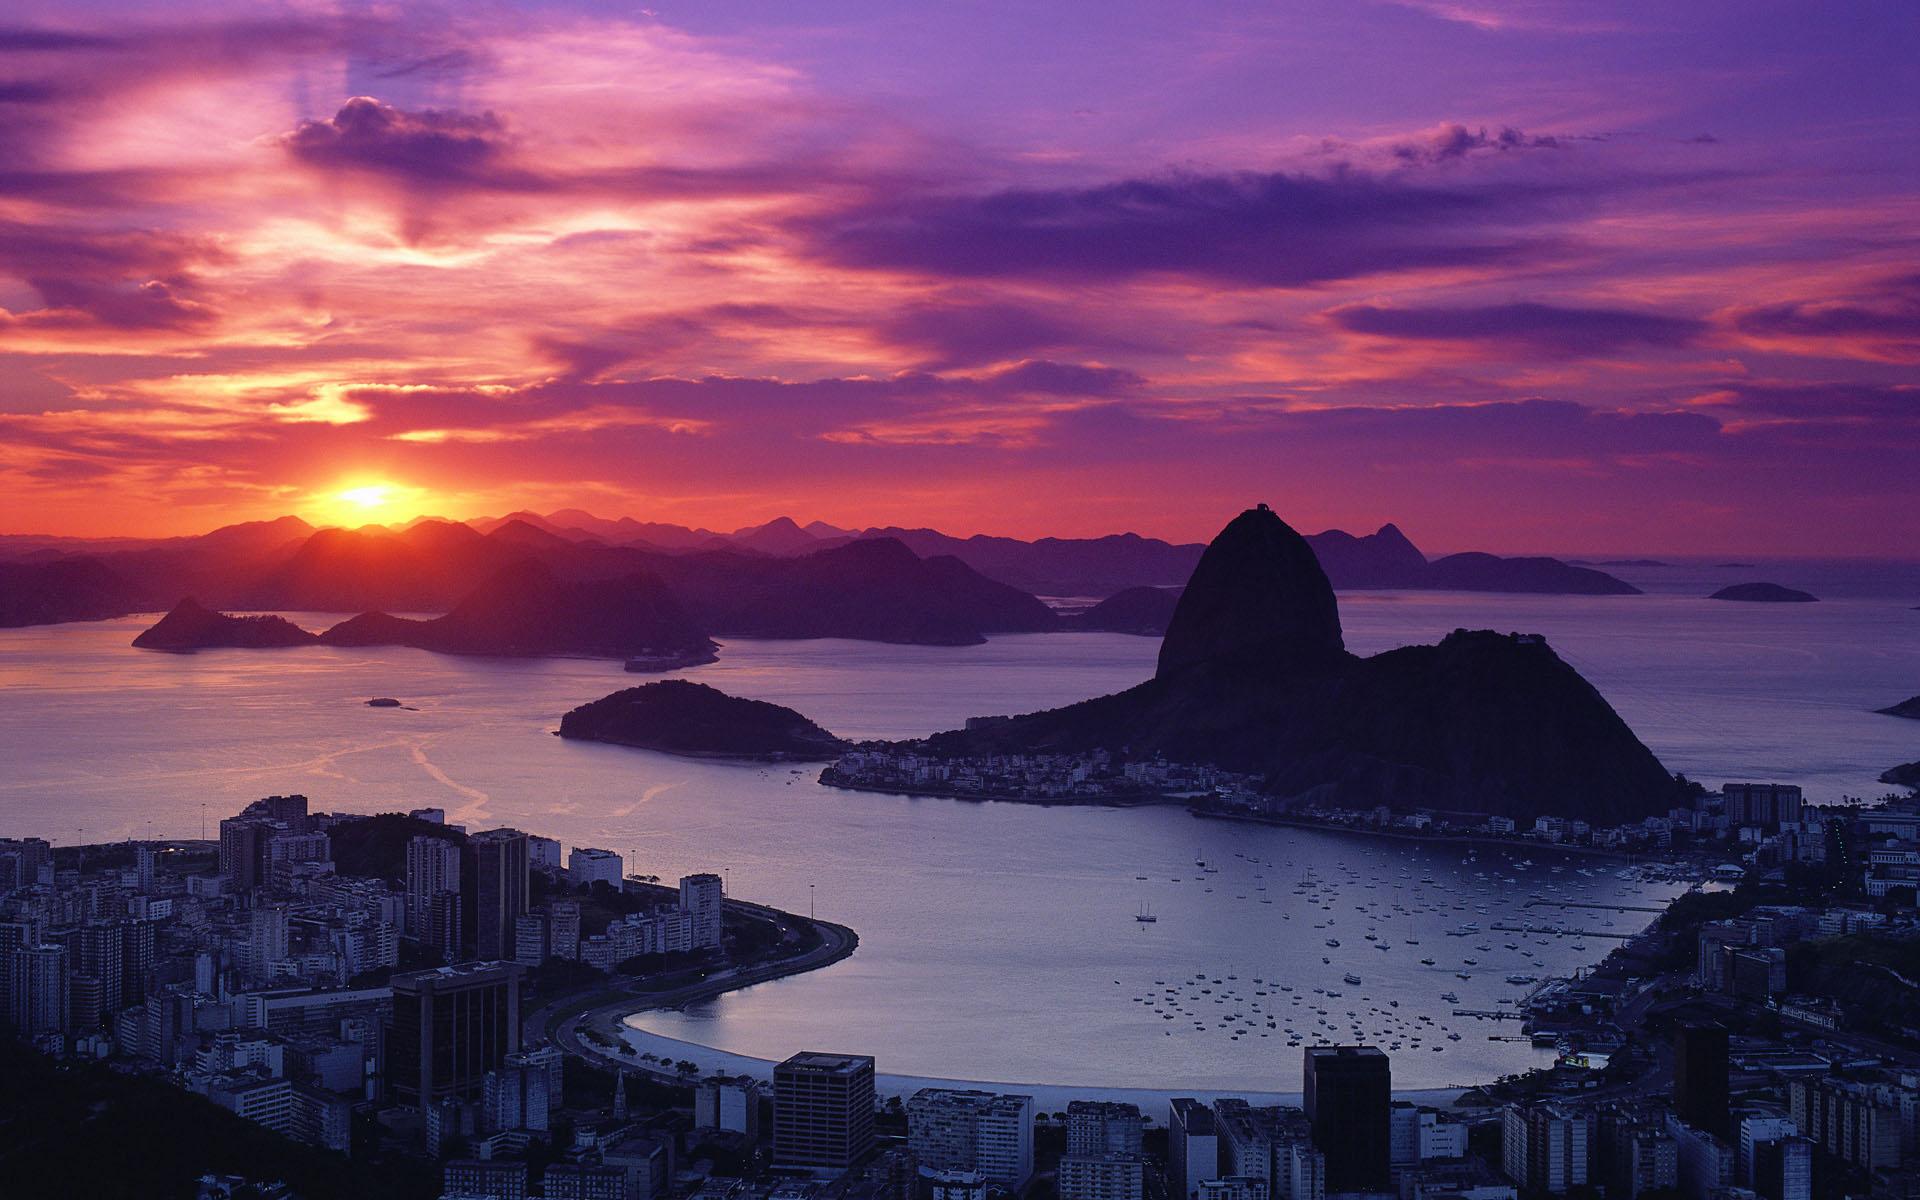 любители винтажа фото красивое природа закат города других